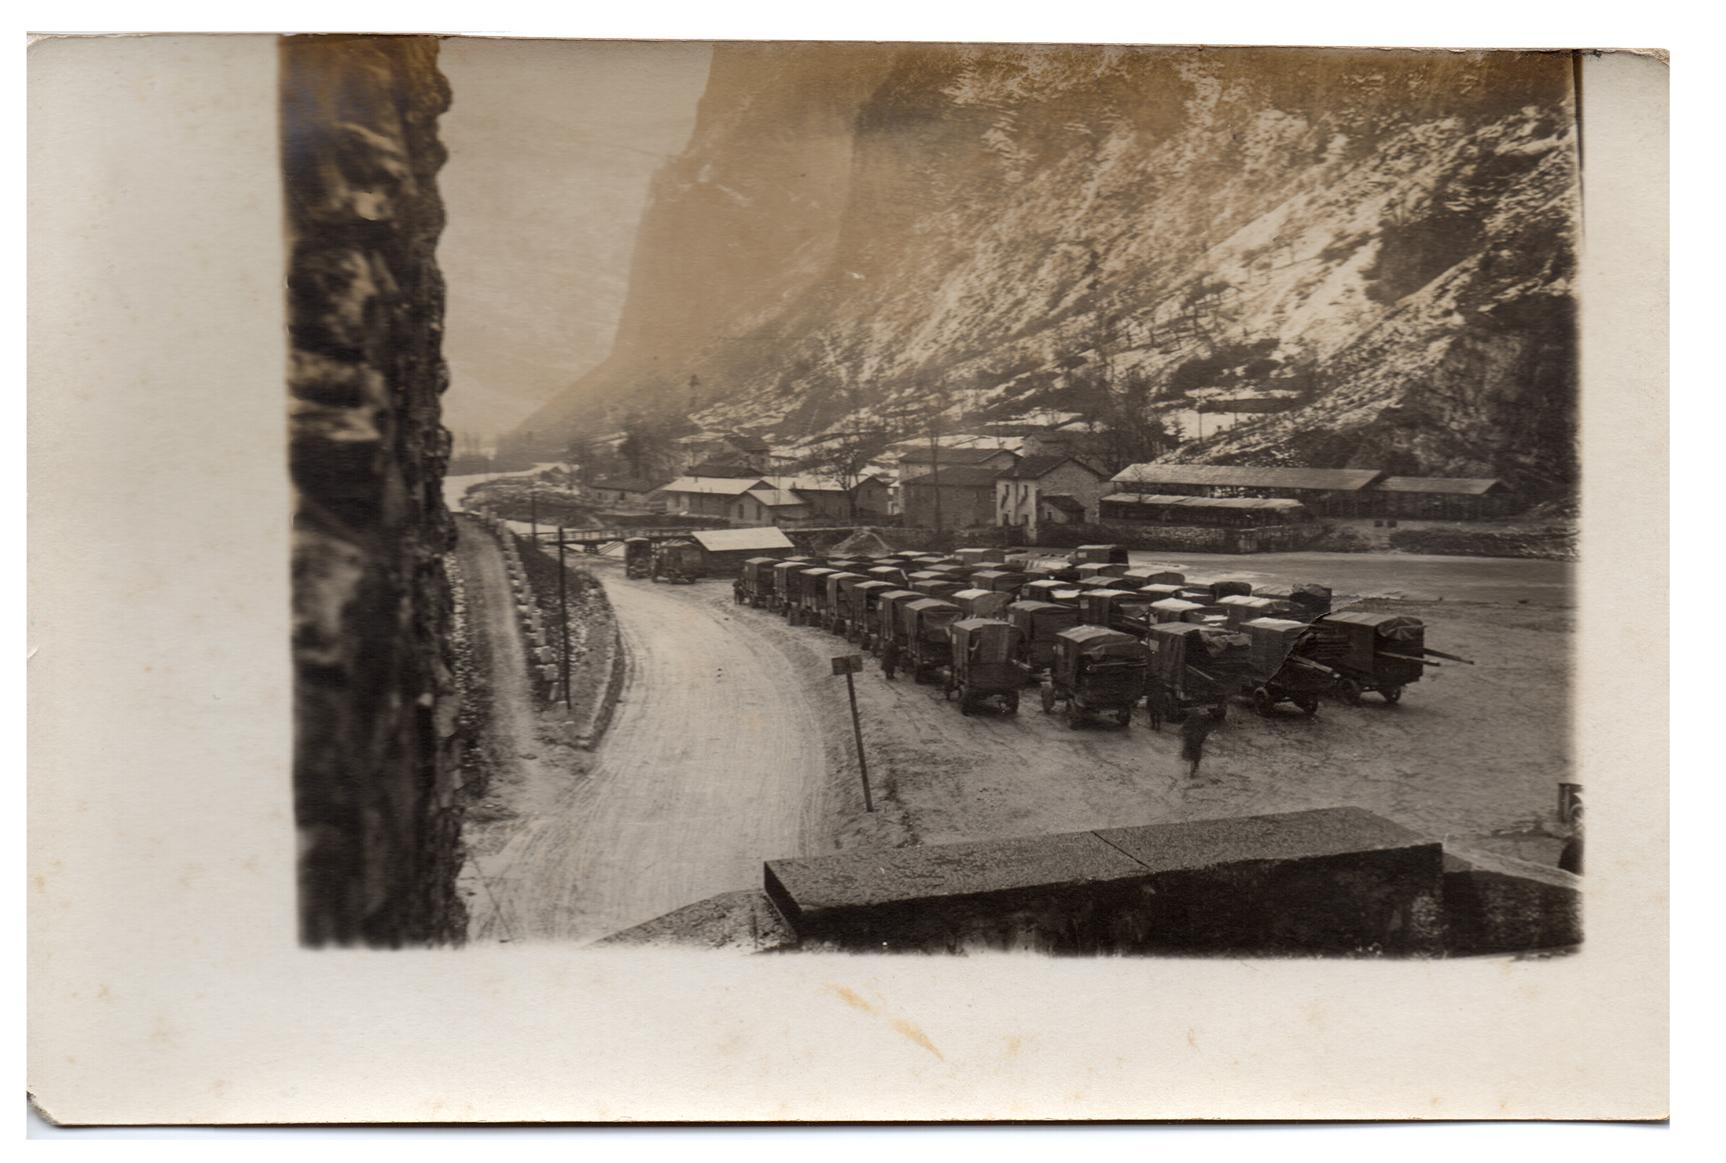 Alpi Giulie - 02 - Val Dogna - (ASDM - coll. Minto)